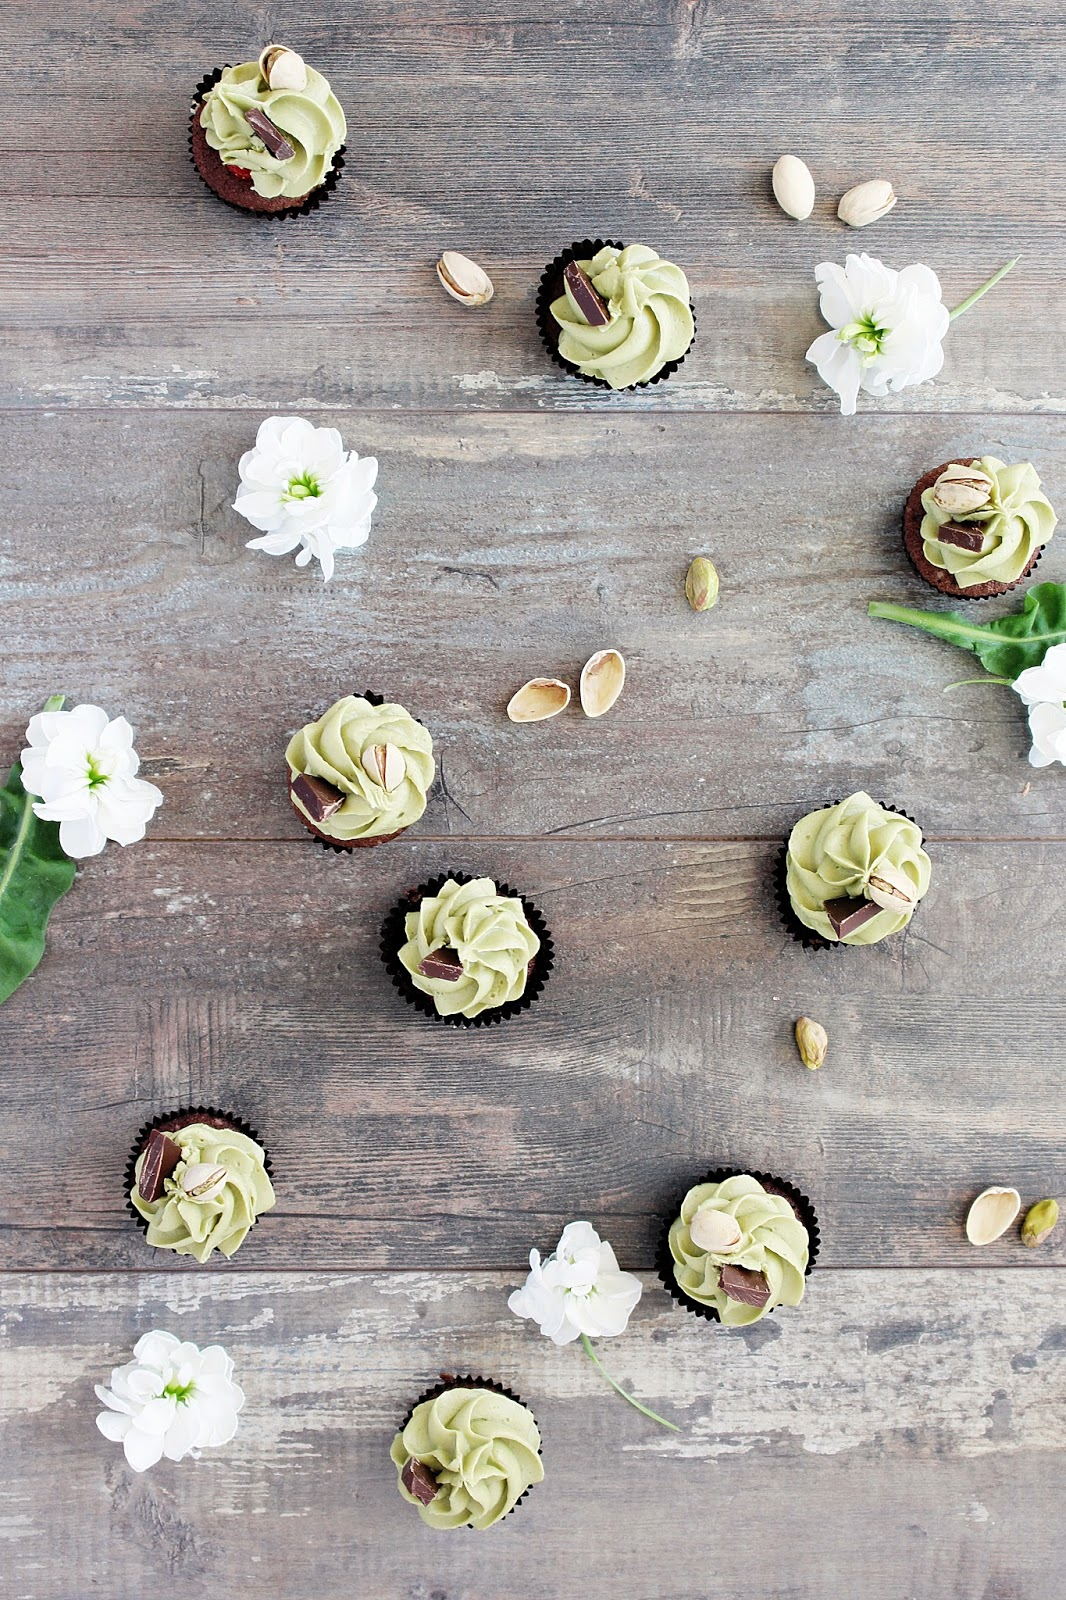 Schokoladen Pistazien Minicupcakes_1